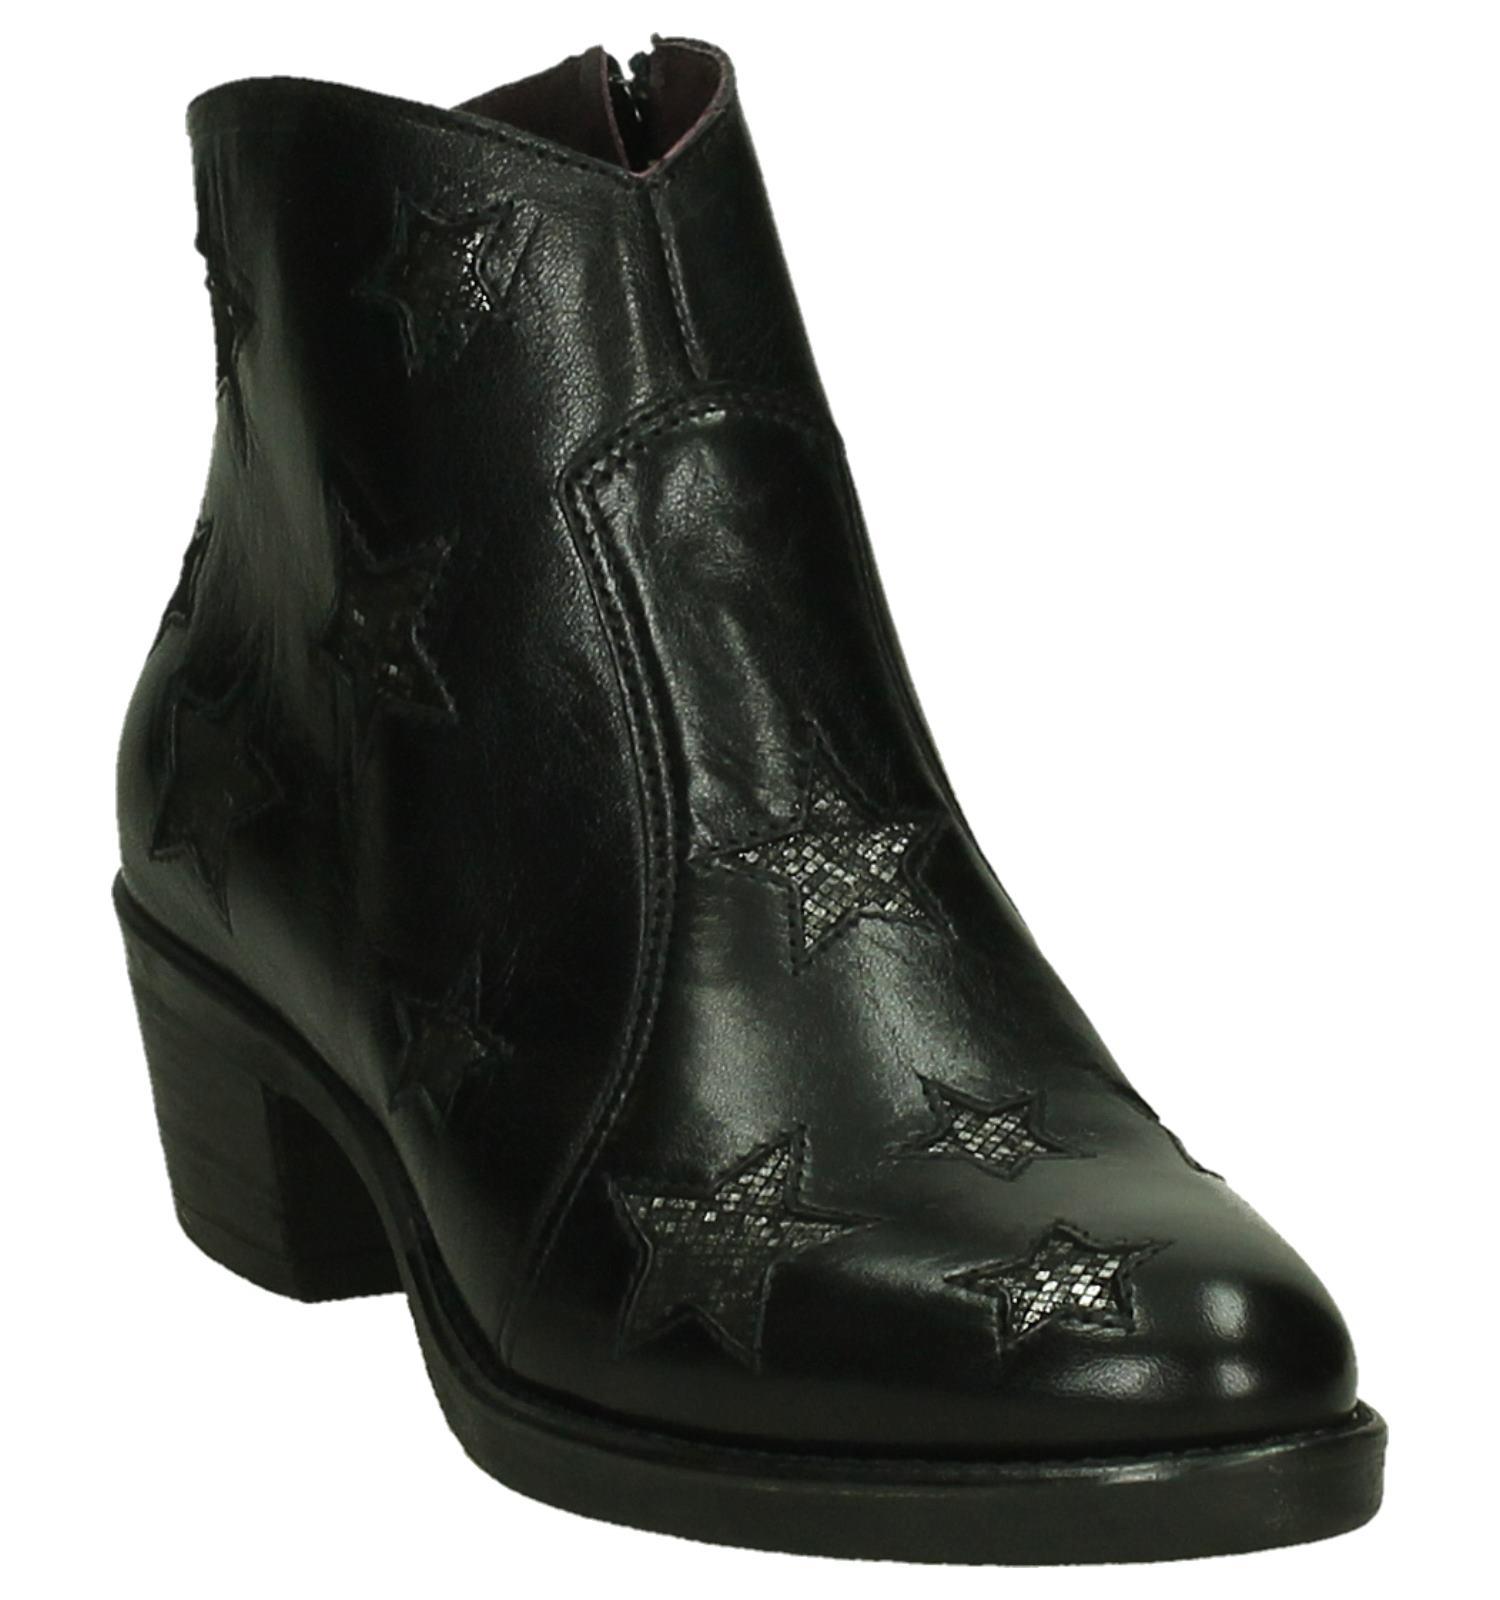 17e1a0e1863 Zwarte Boots Brako Anatomics | TORFS.BE | Gratis verzend en retour